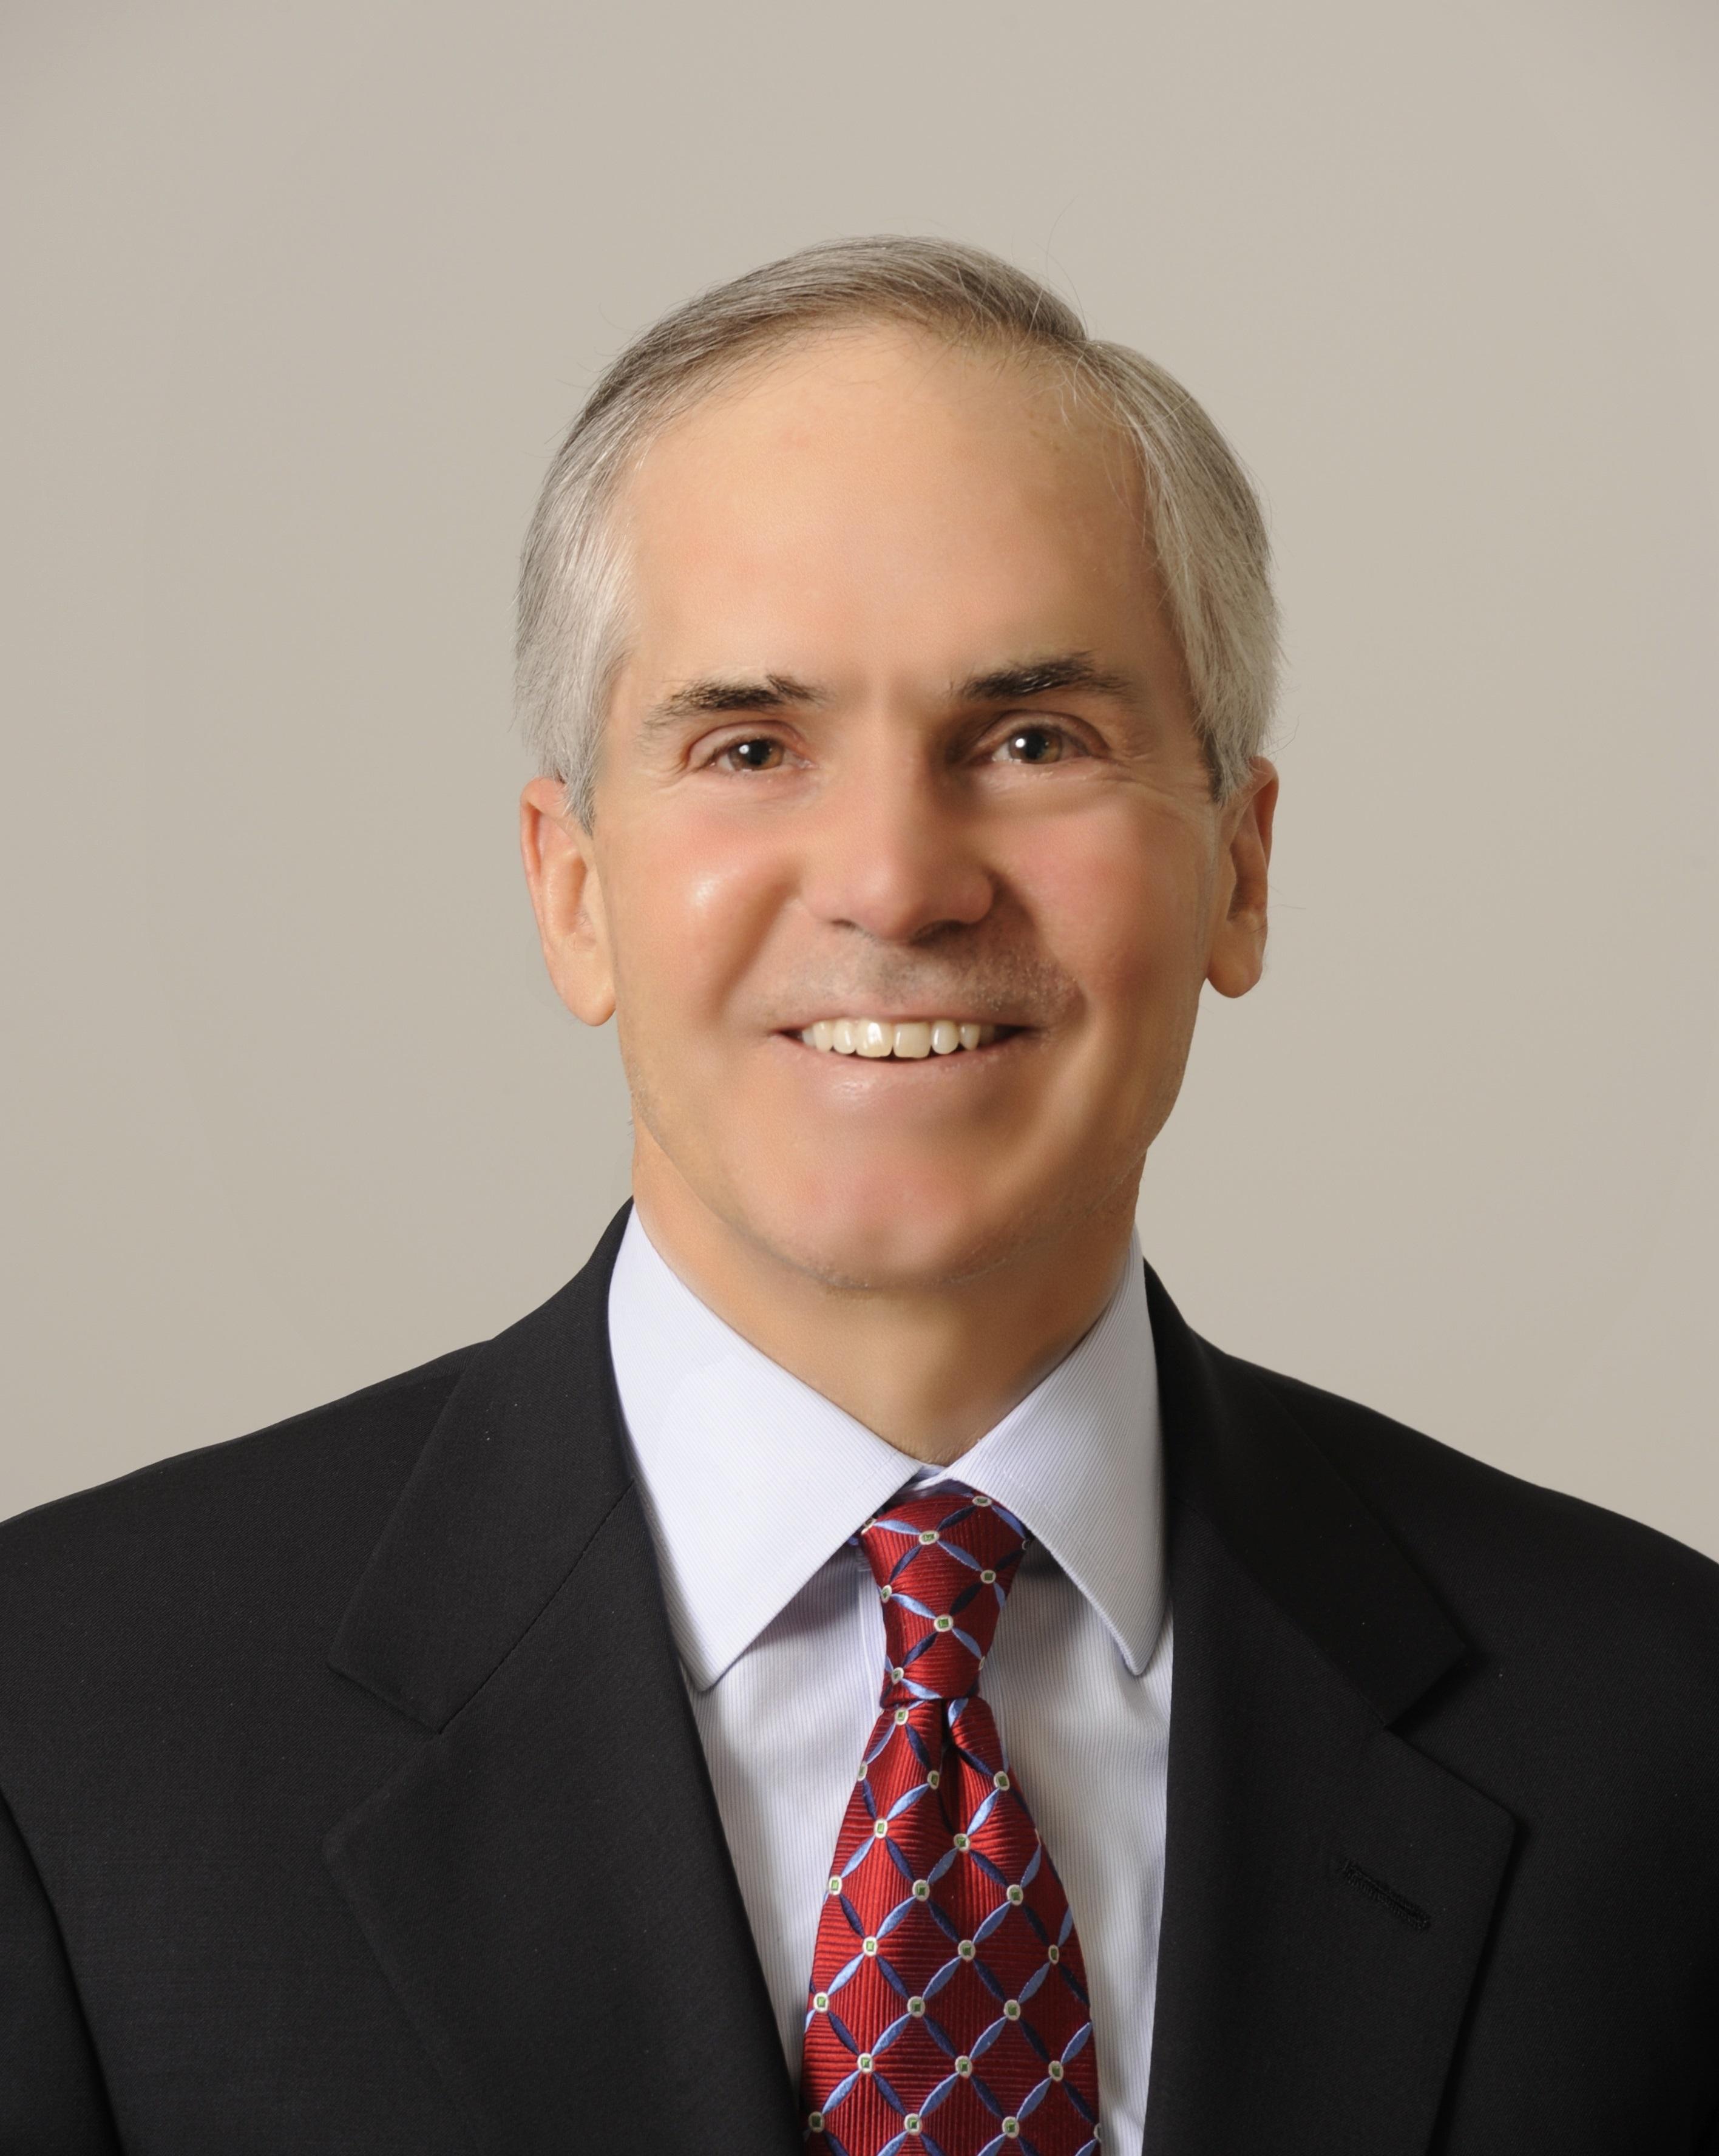 Mark Toledo, CFA